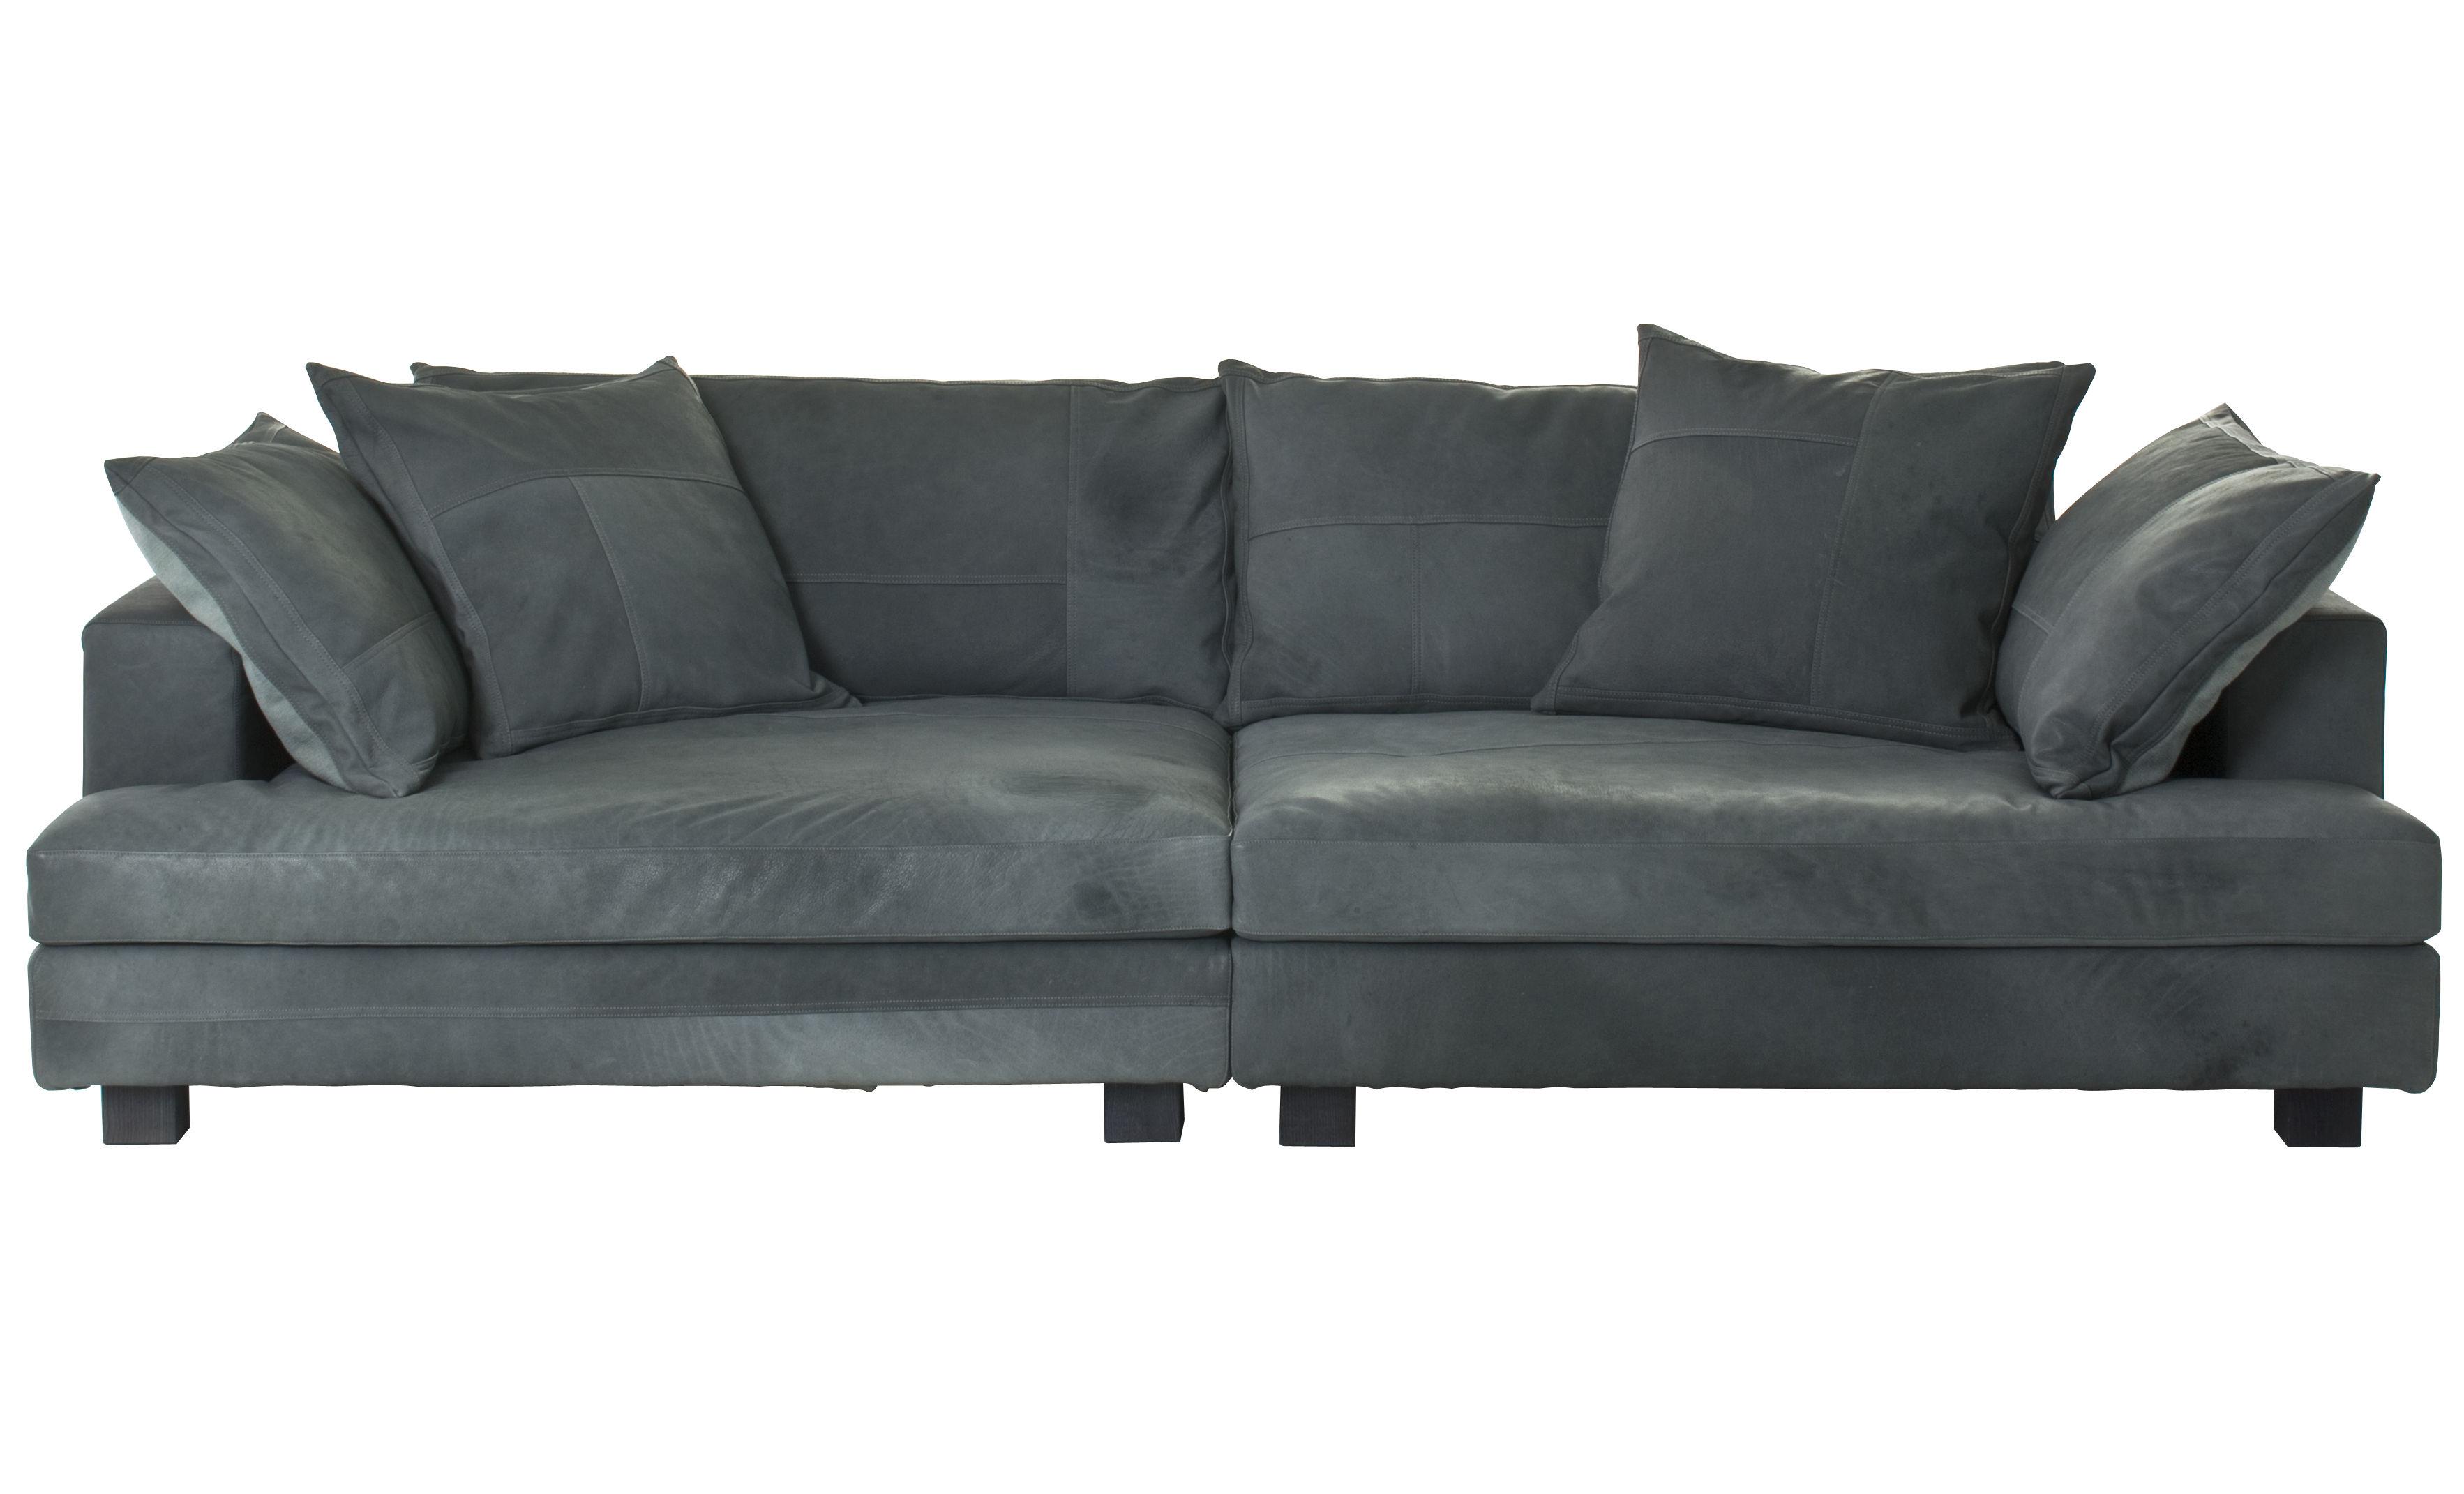 canap droit cloud atlas cuir 3 places l 220 cm cuir bleu vert diesel with moroso made. Black Bedroom Furniture Sets. Home Design Ideas